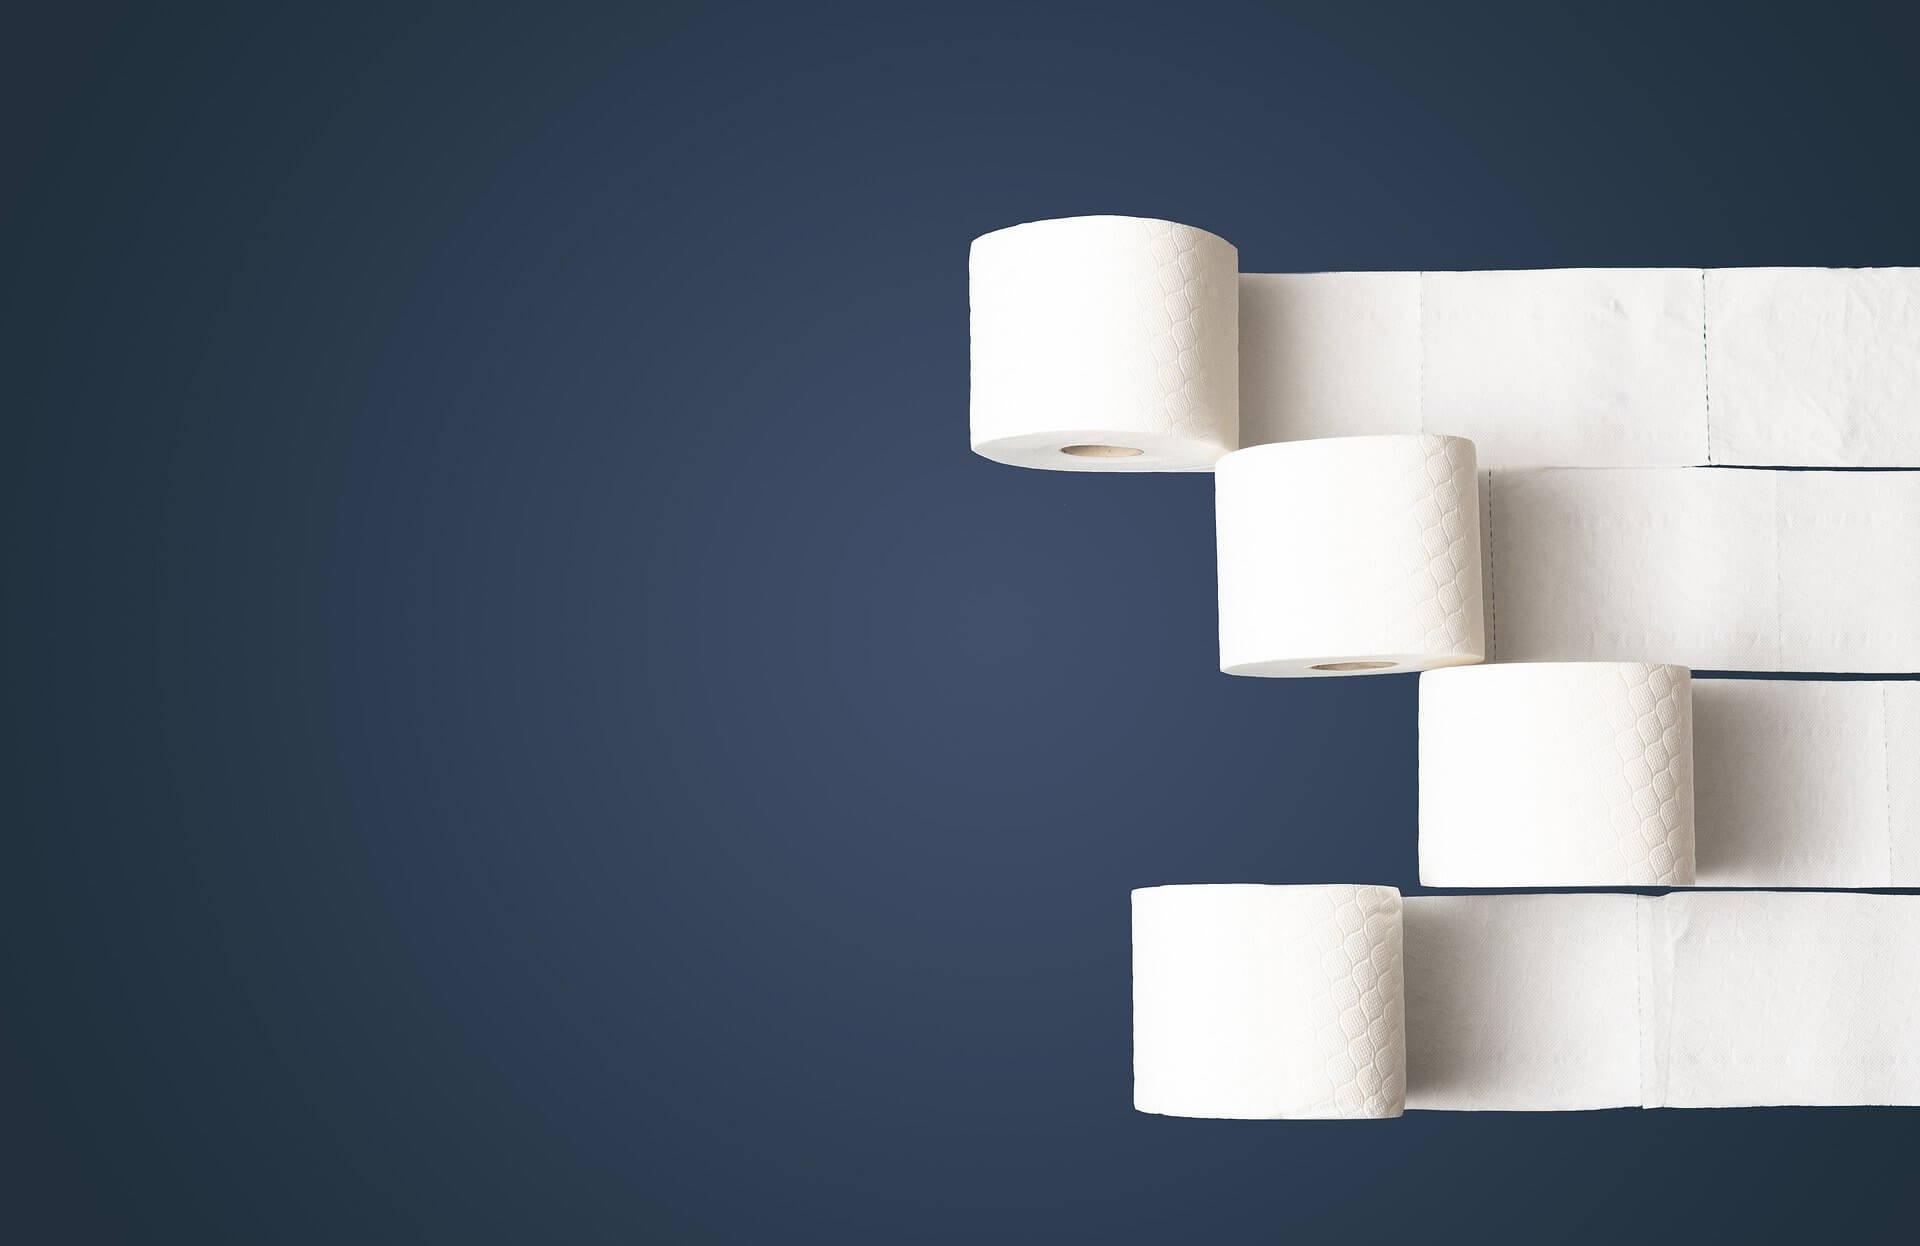 toilet-paper-4974461_1920